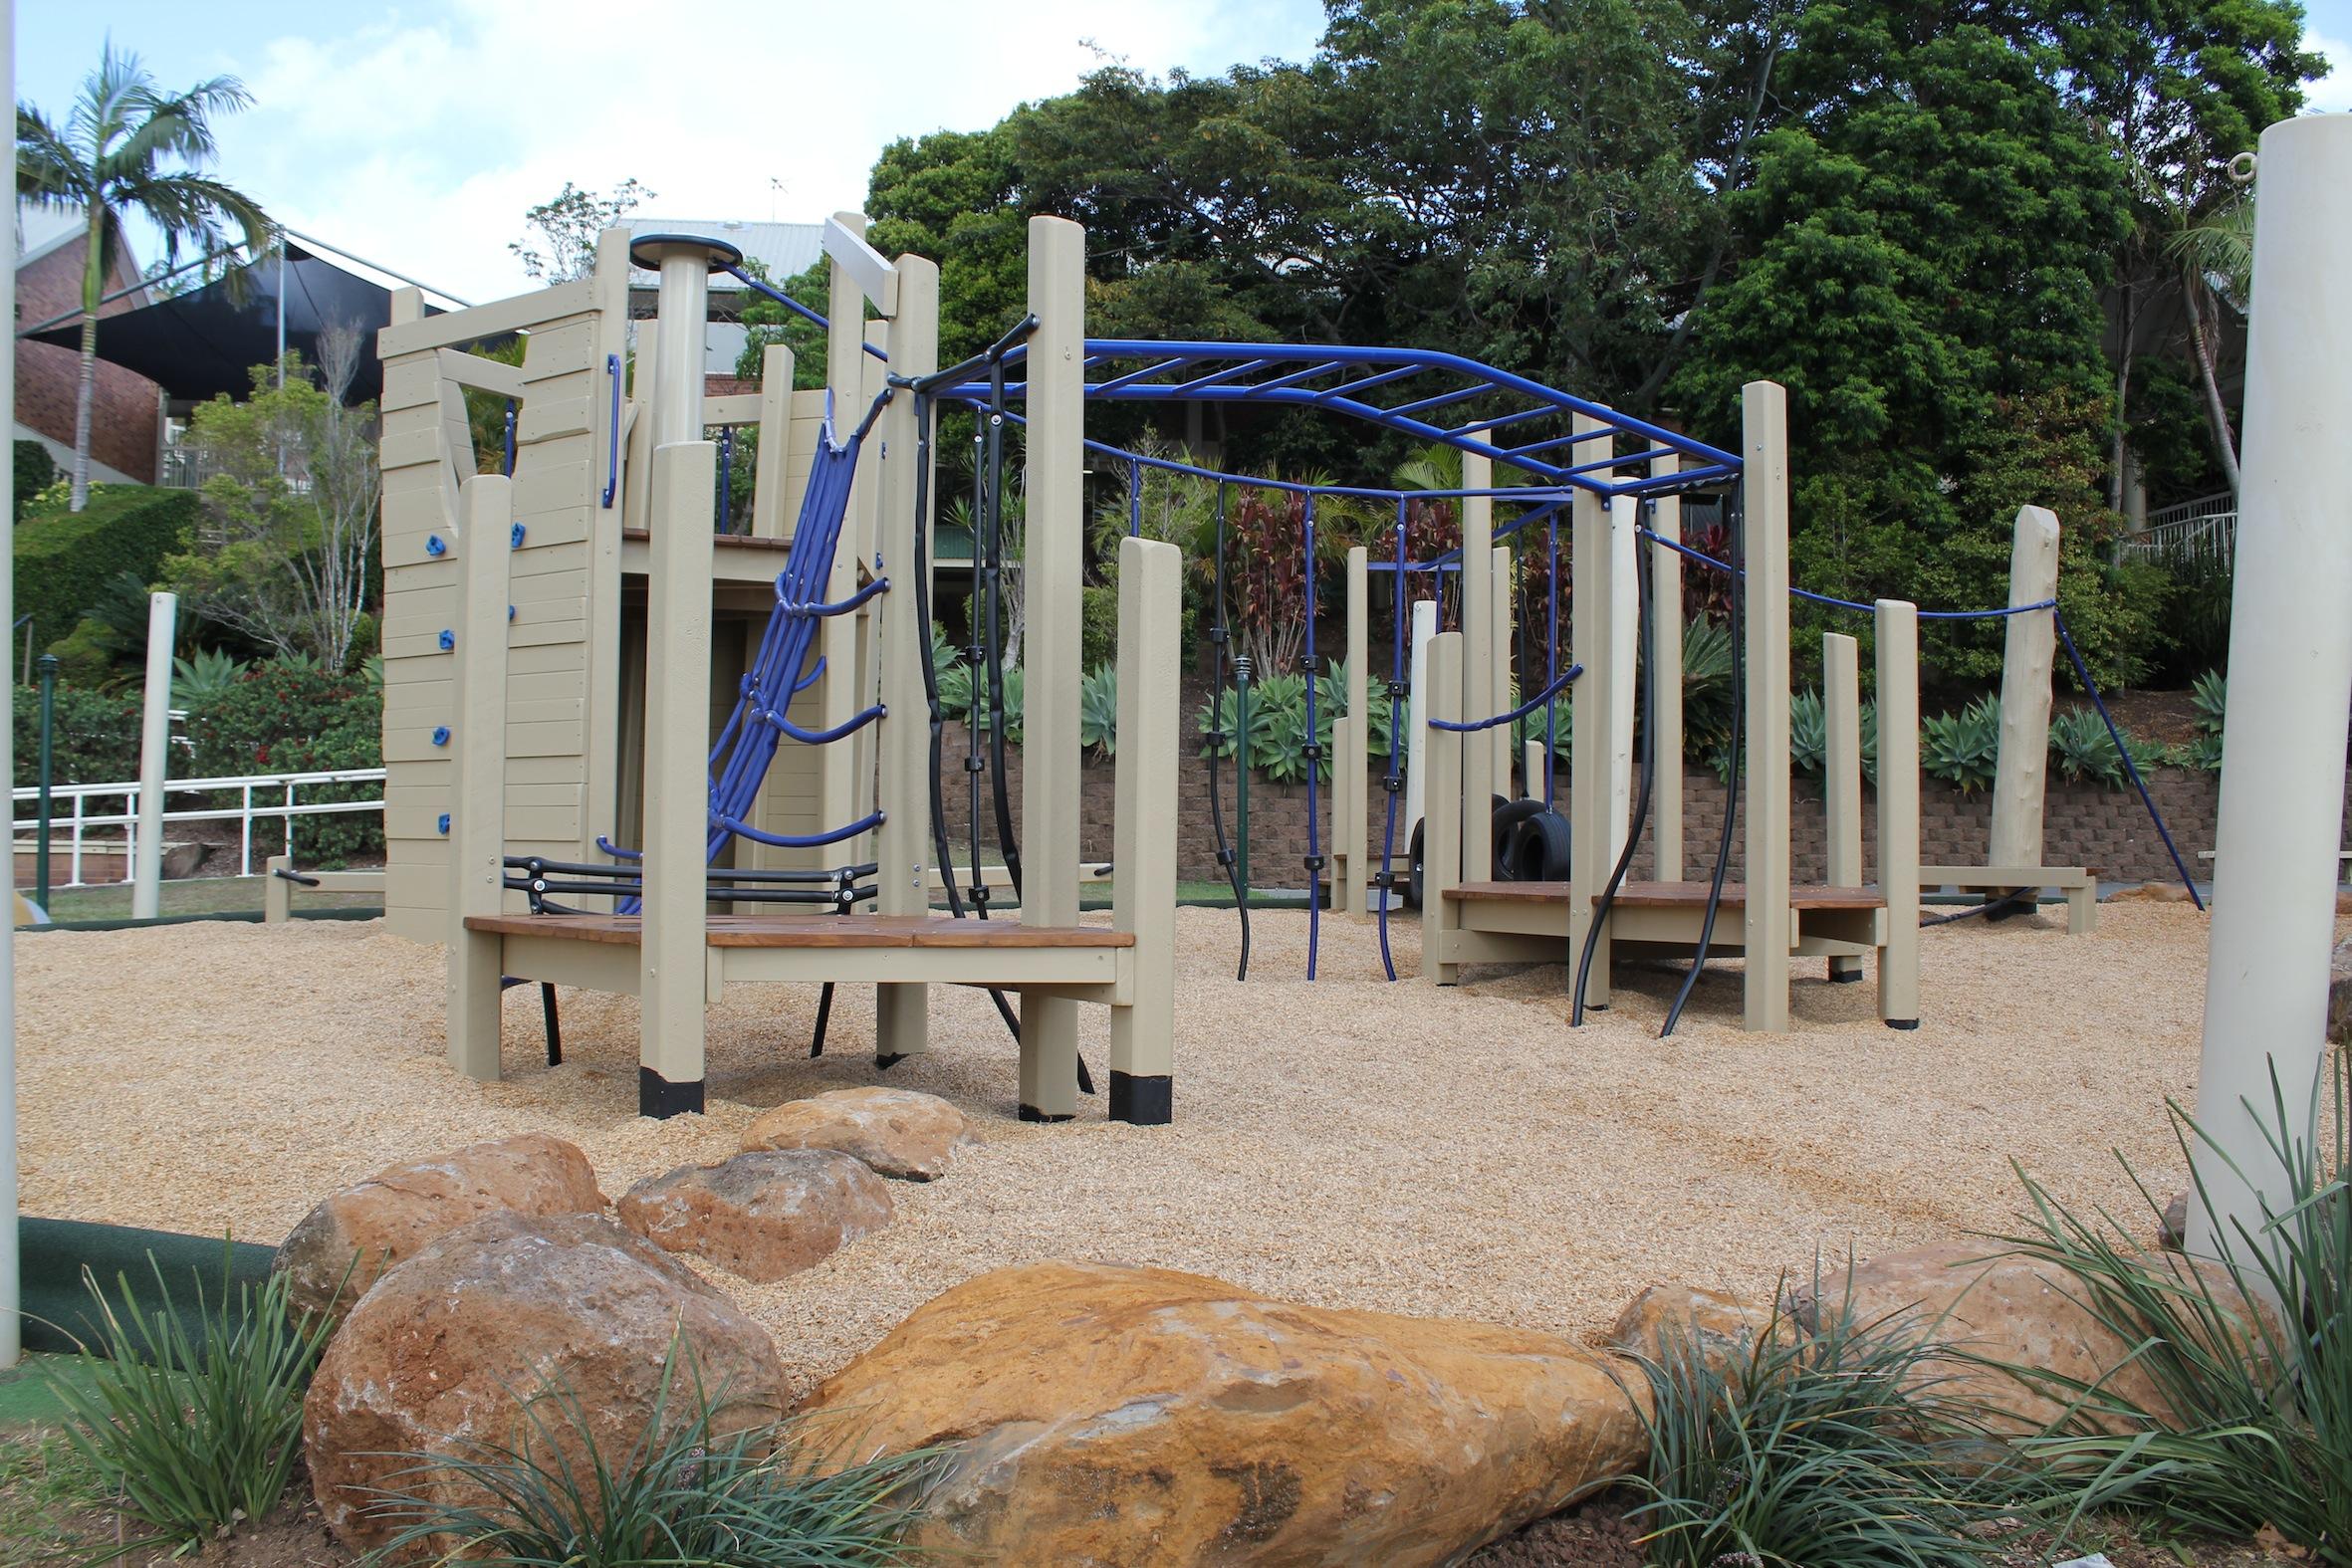 Climb walls, Pommel walk, Nets and balance beams